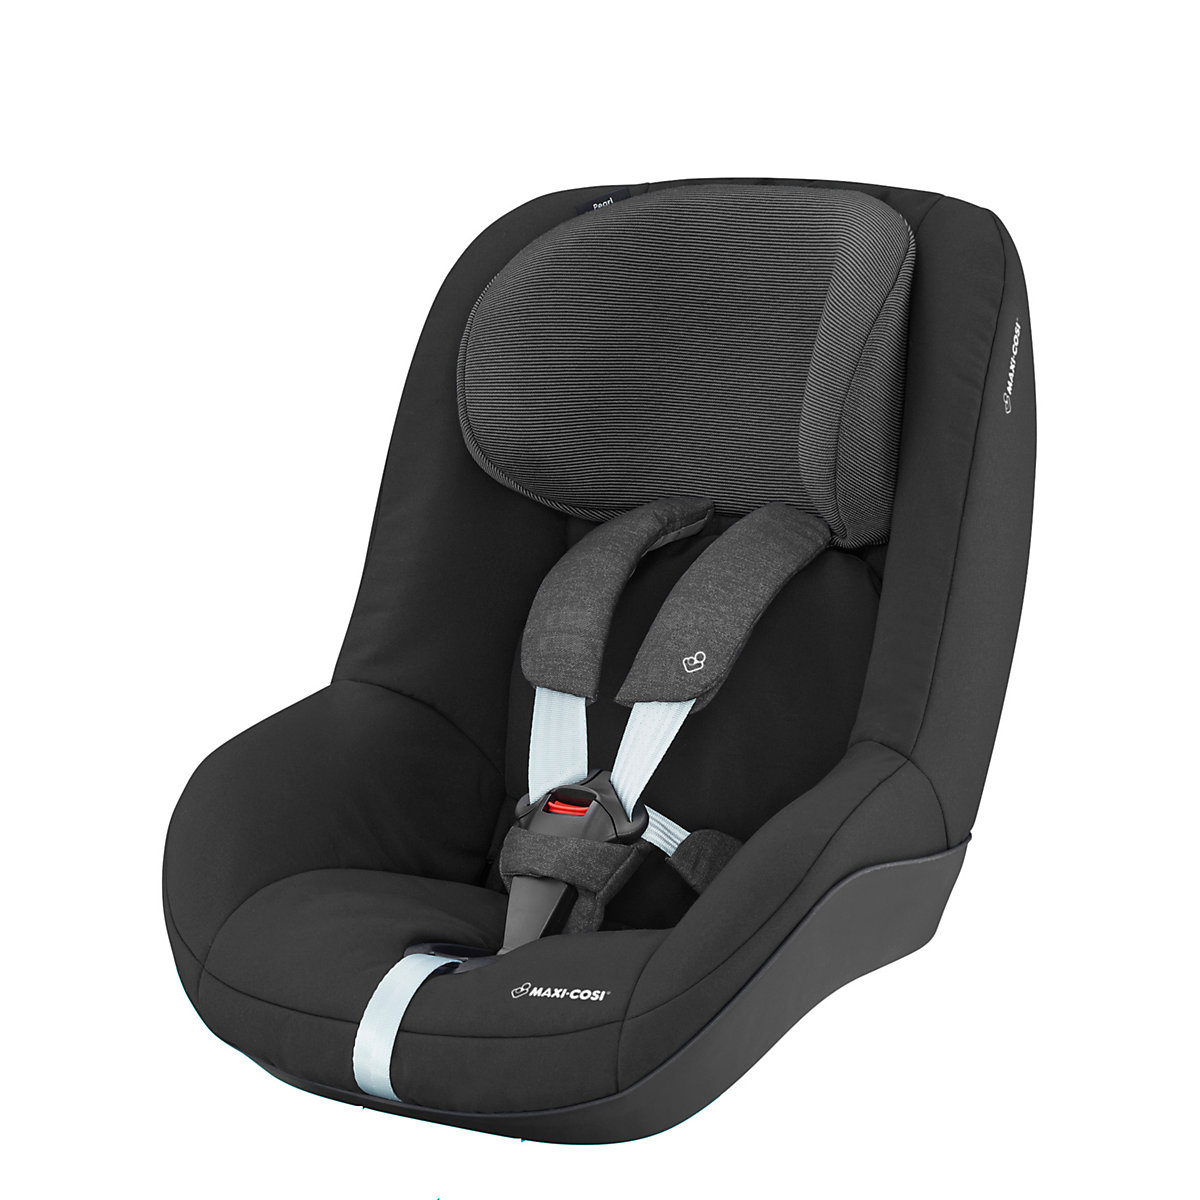 Maxi Cosi 2wayPearl car seat – Nomad Black